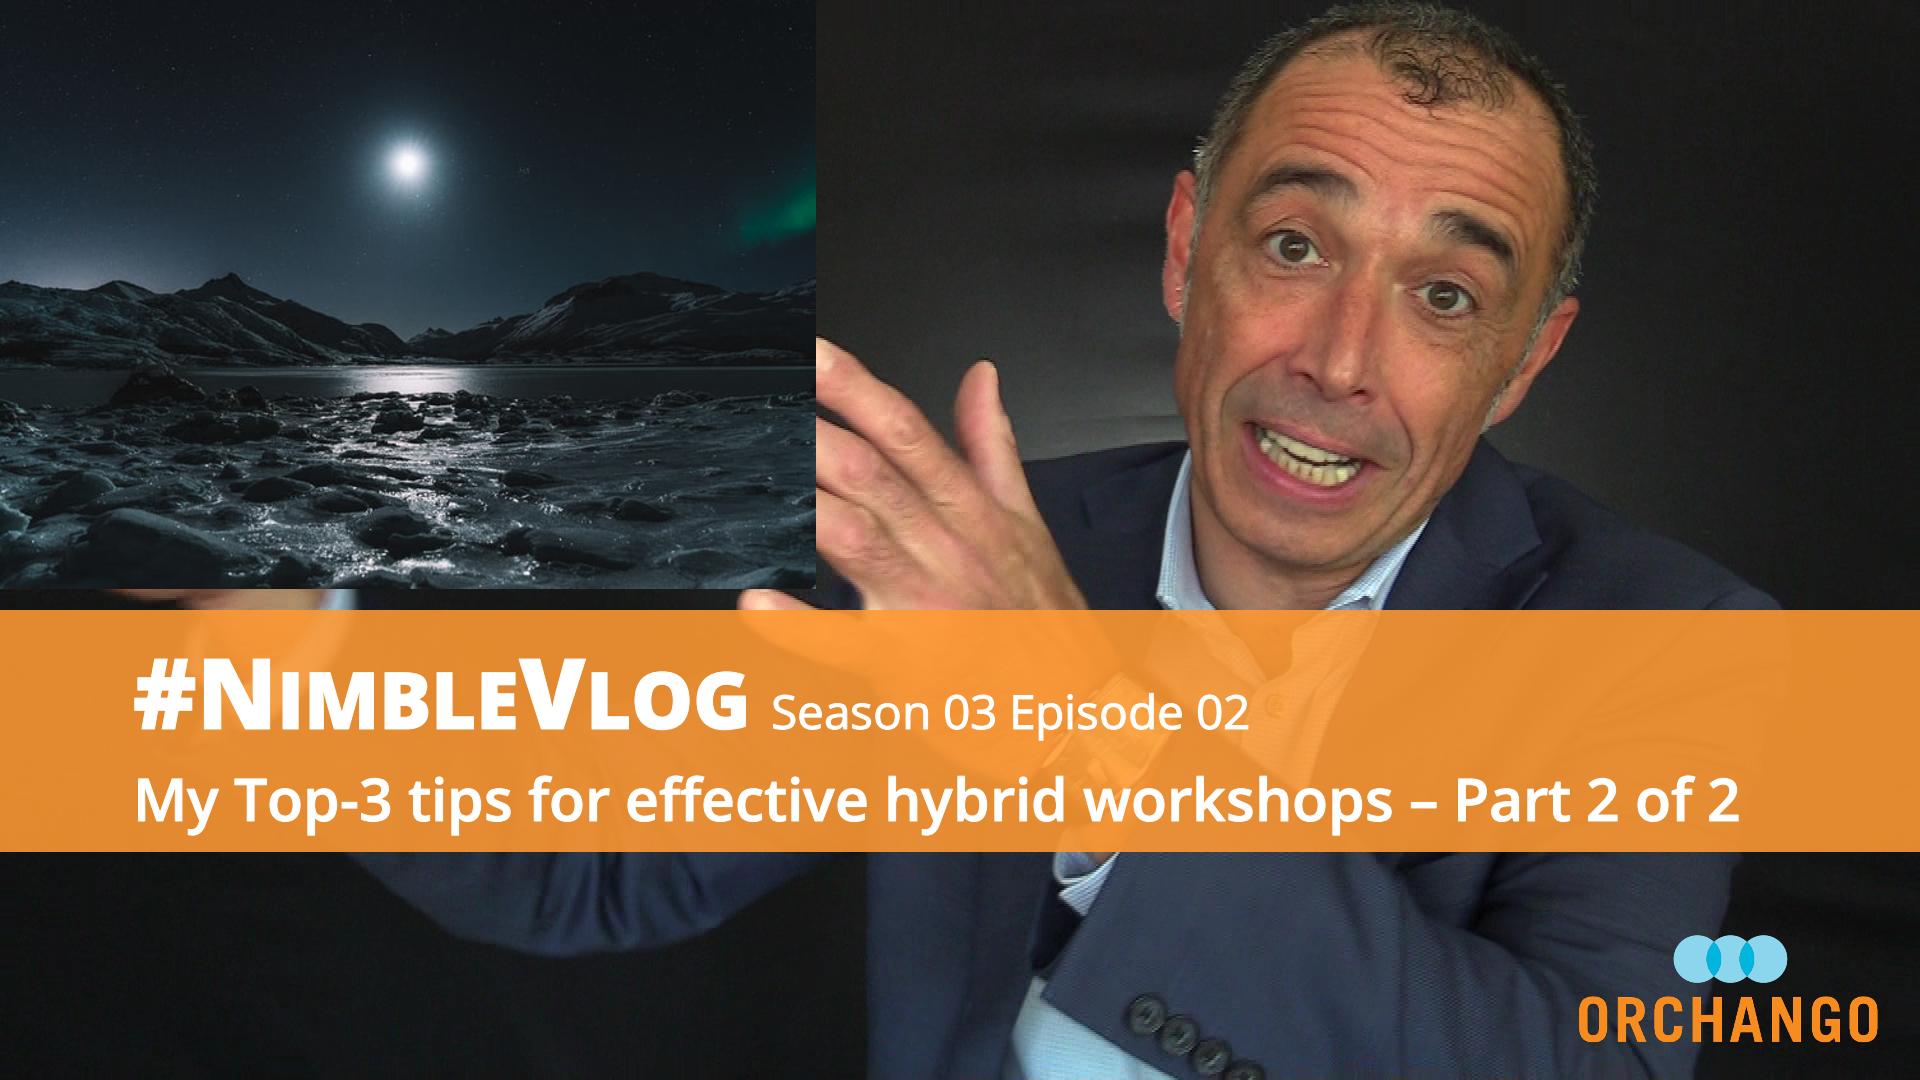 #NimbleVlog S03 E01 – My Top-3 Tips For Effective Hybrid Workshops – Part 2 Of 2